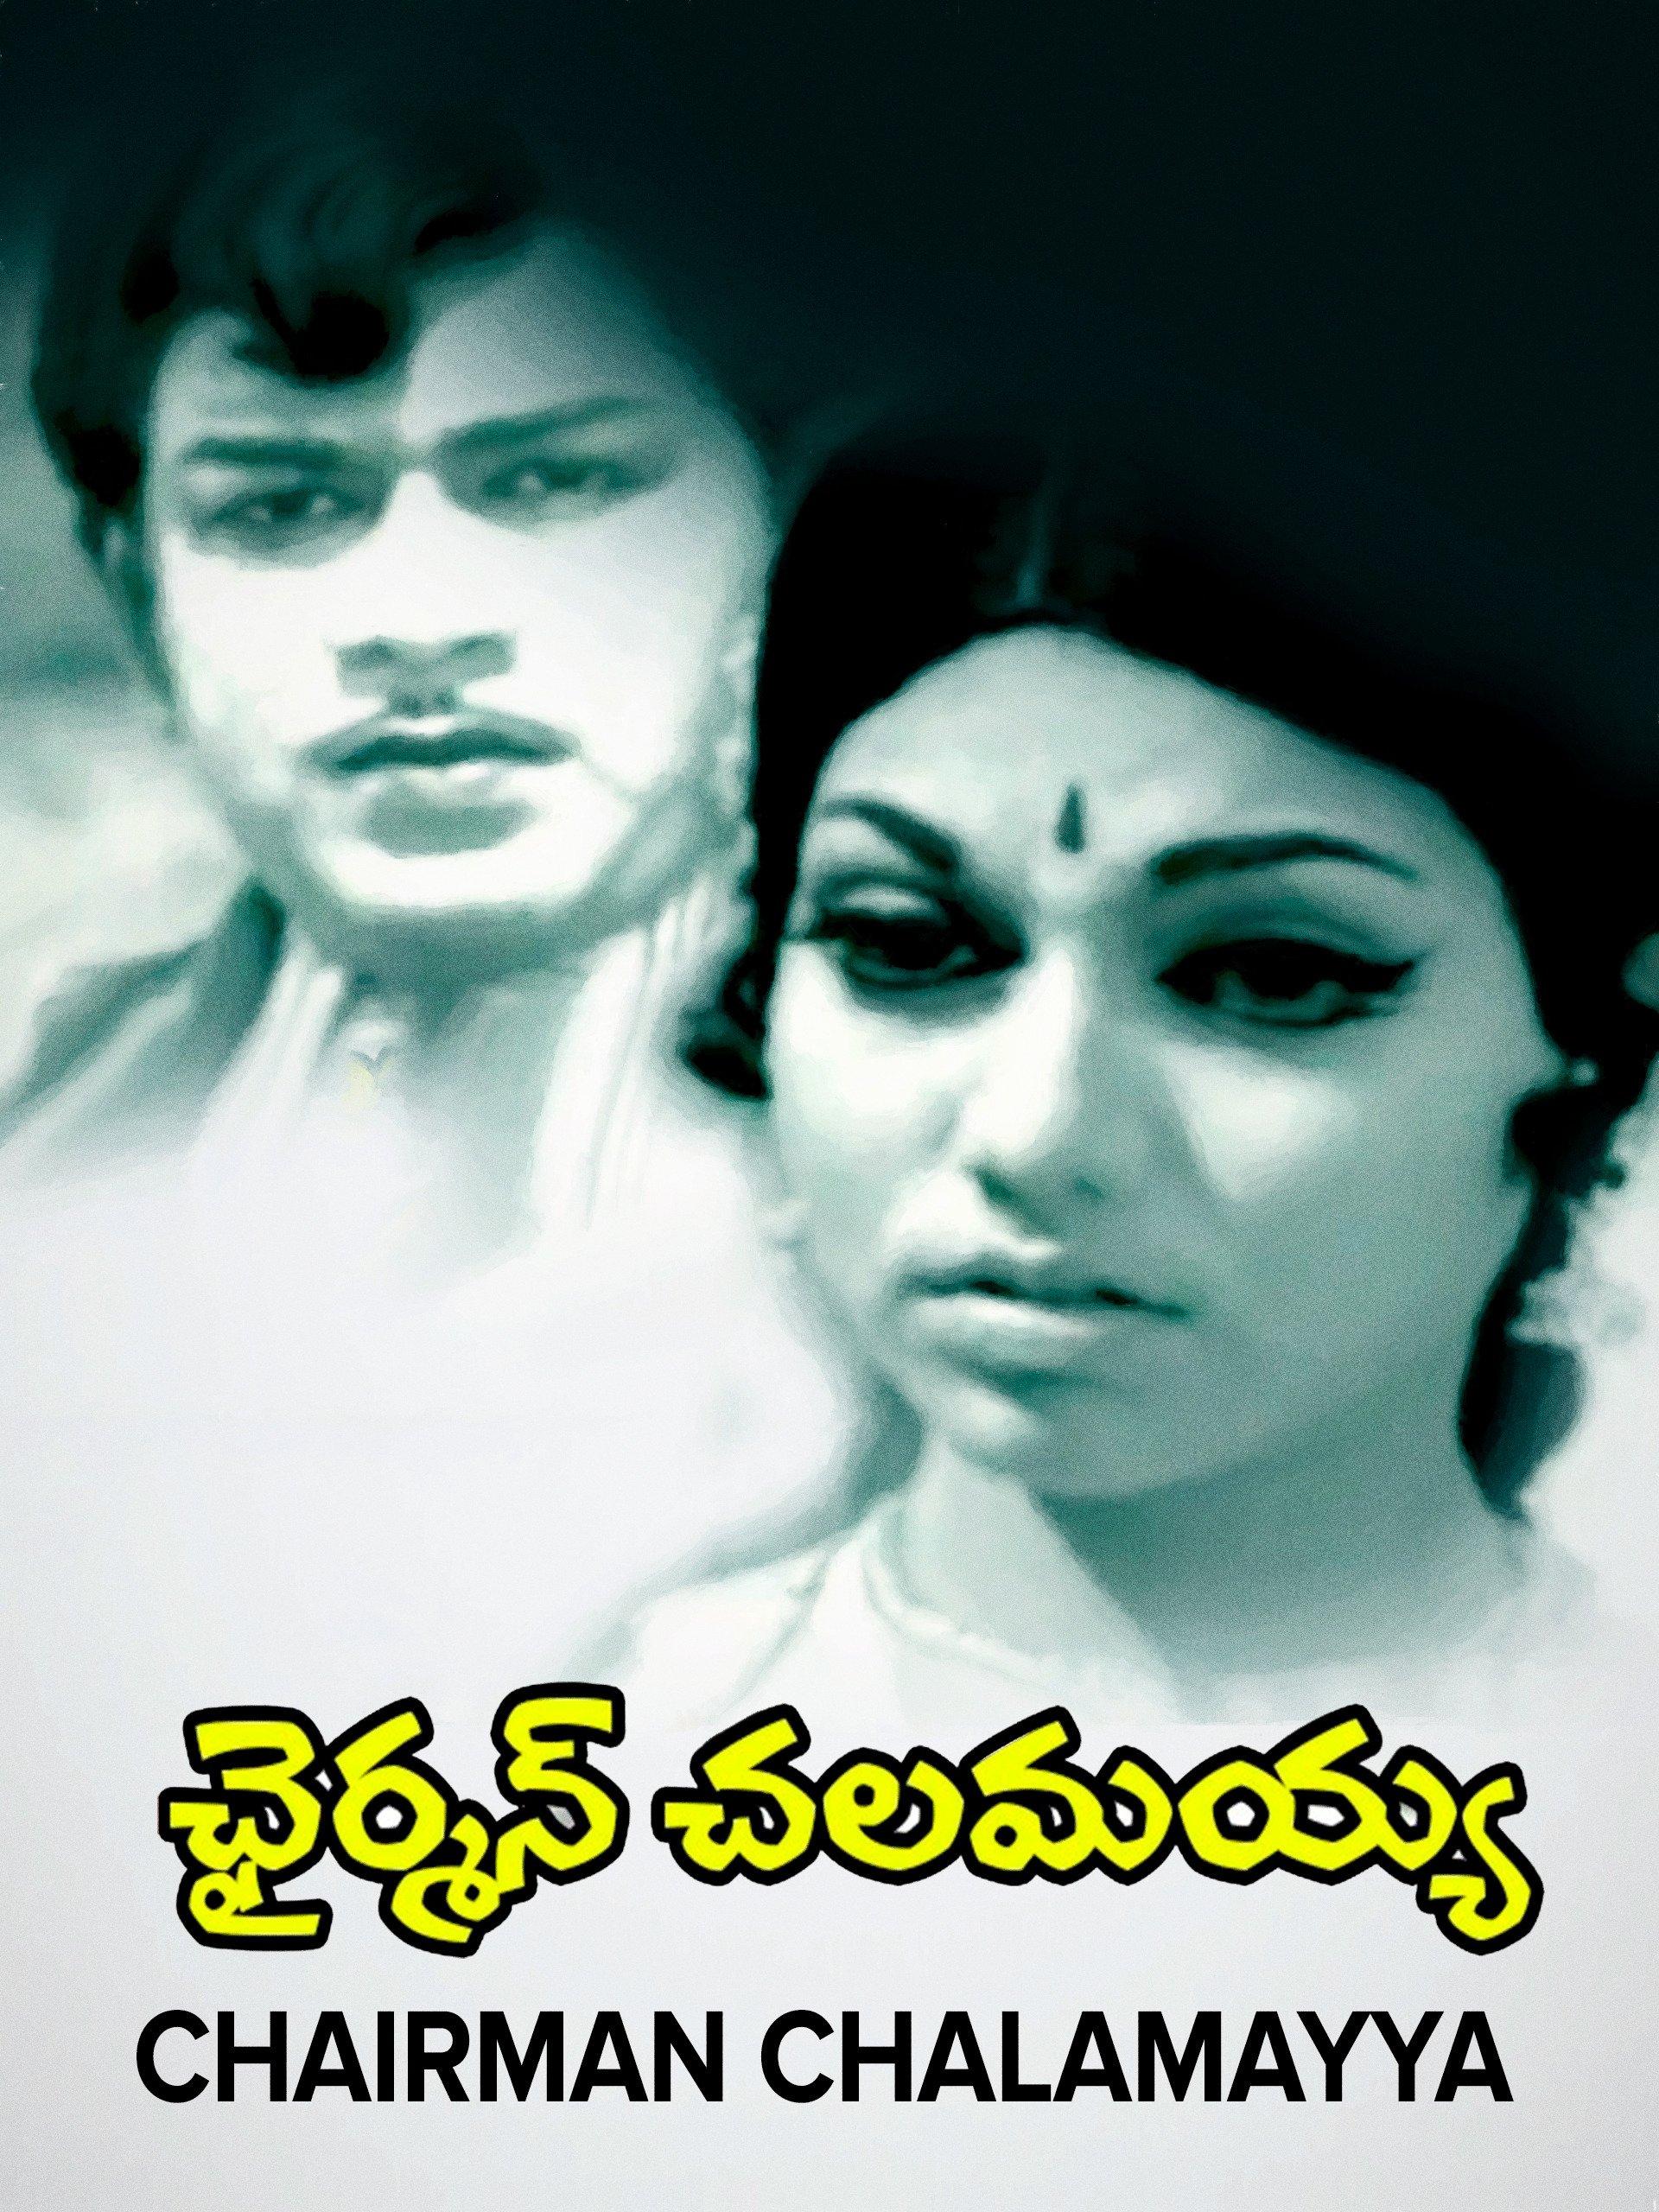 chairman chalamayya movie songs